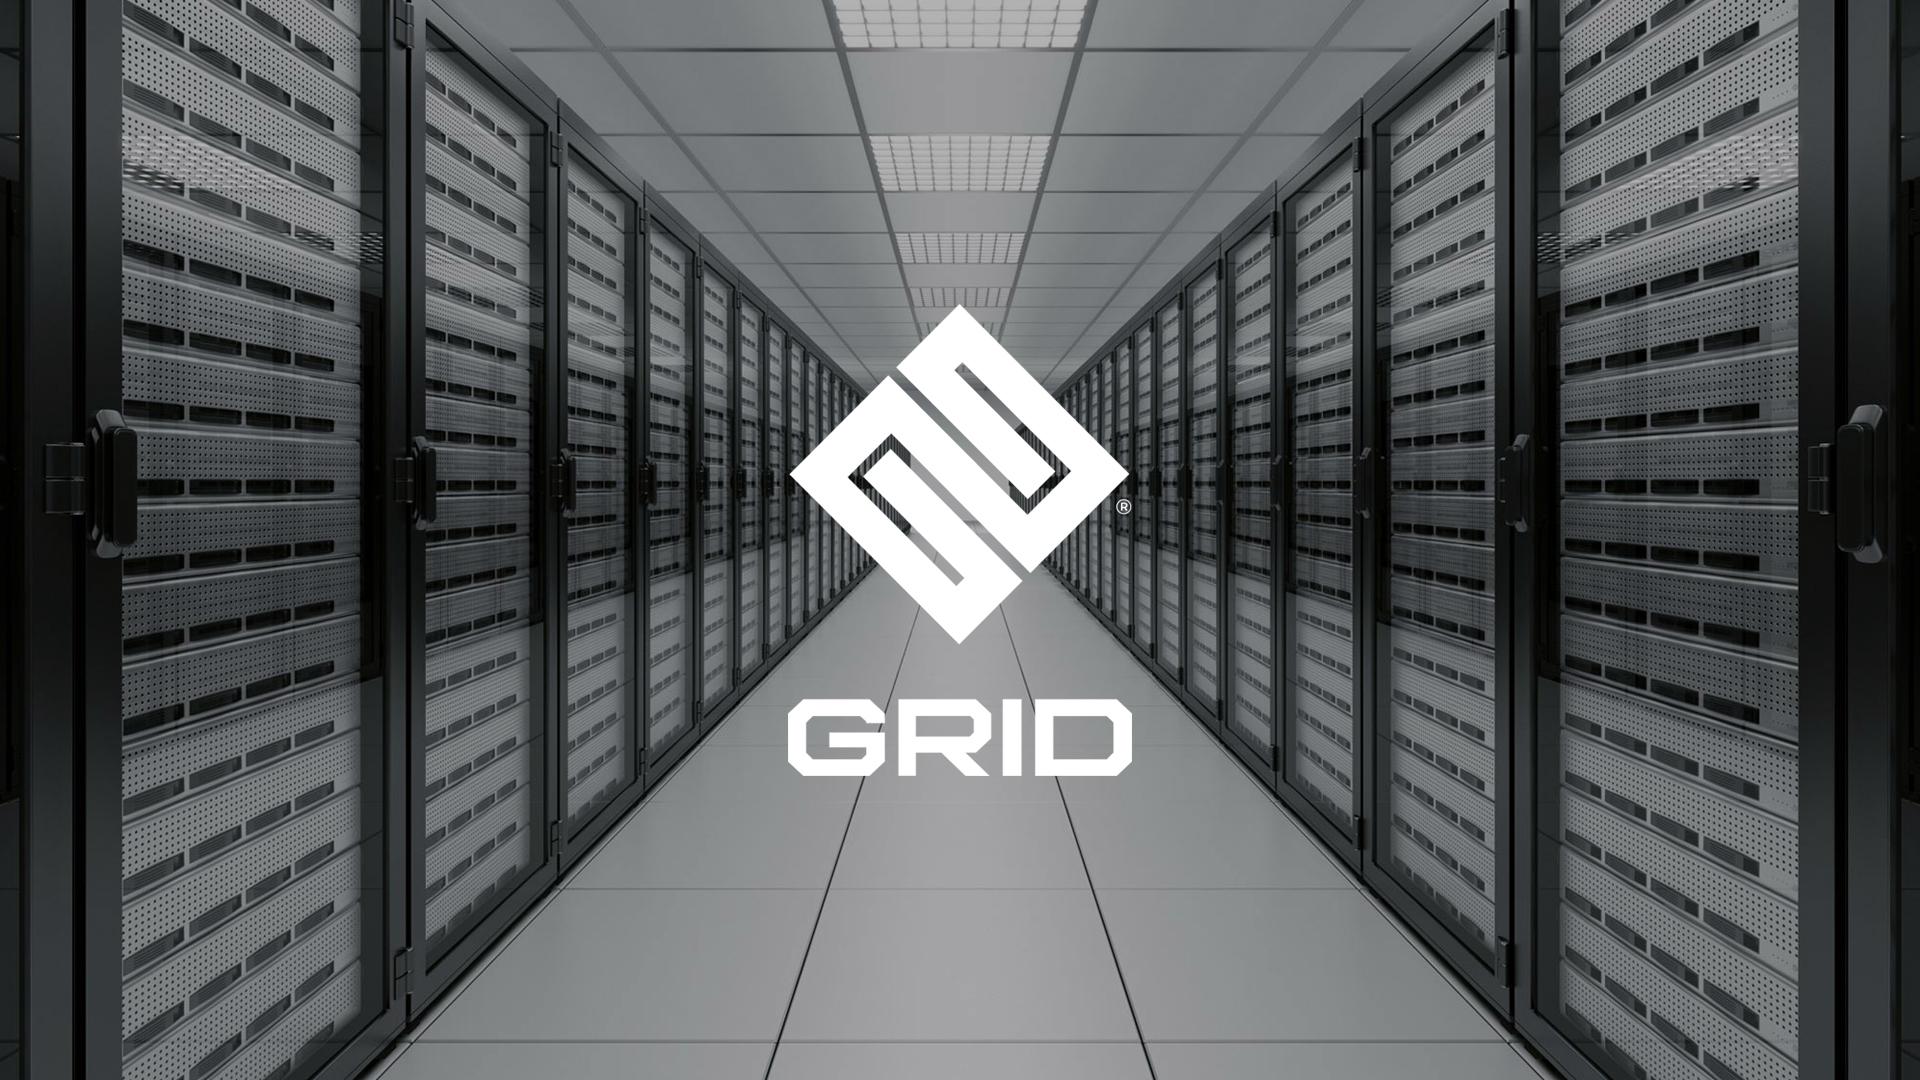 GRID Group LTD